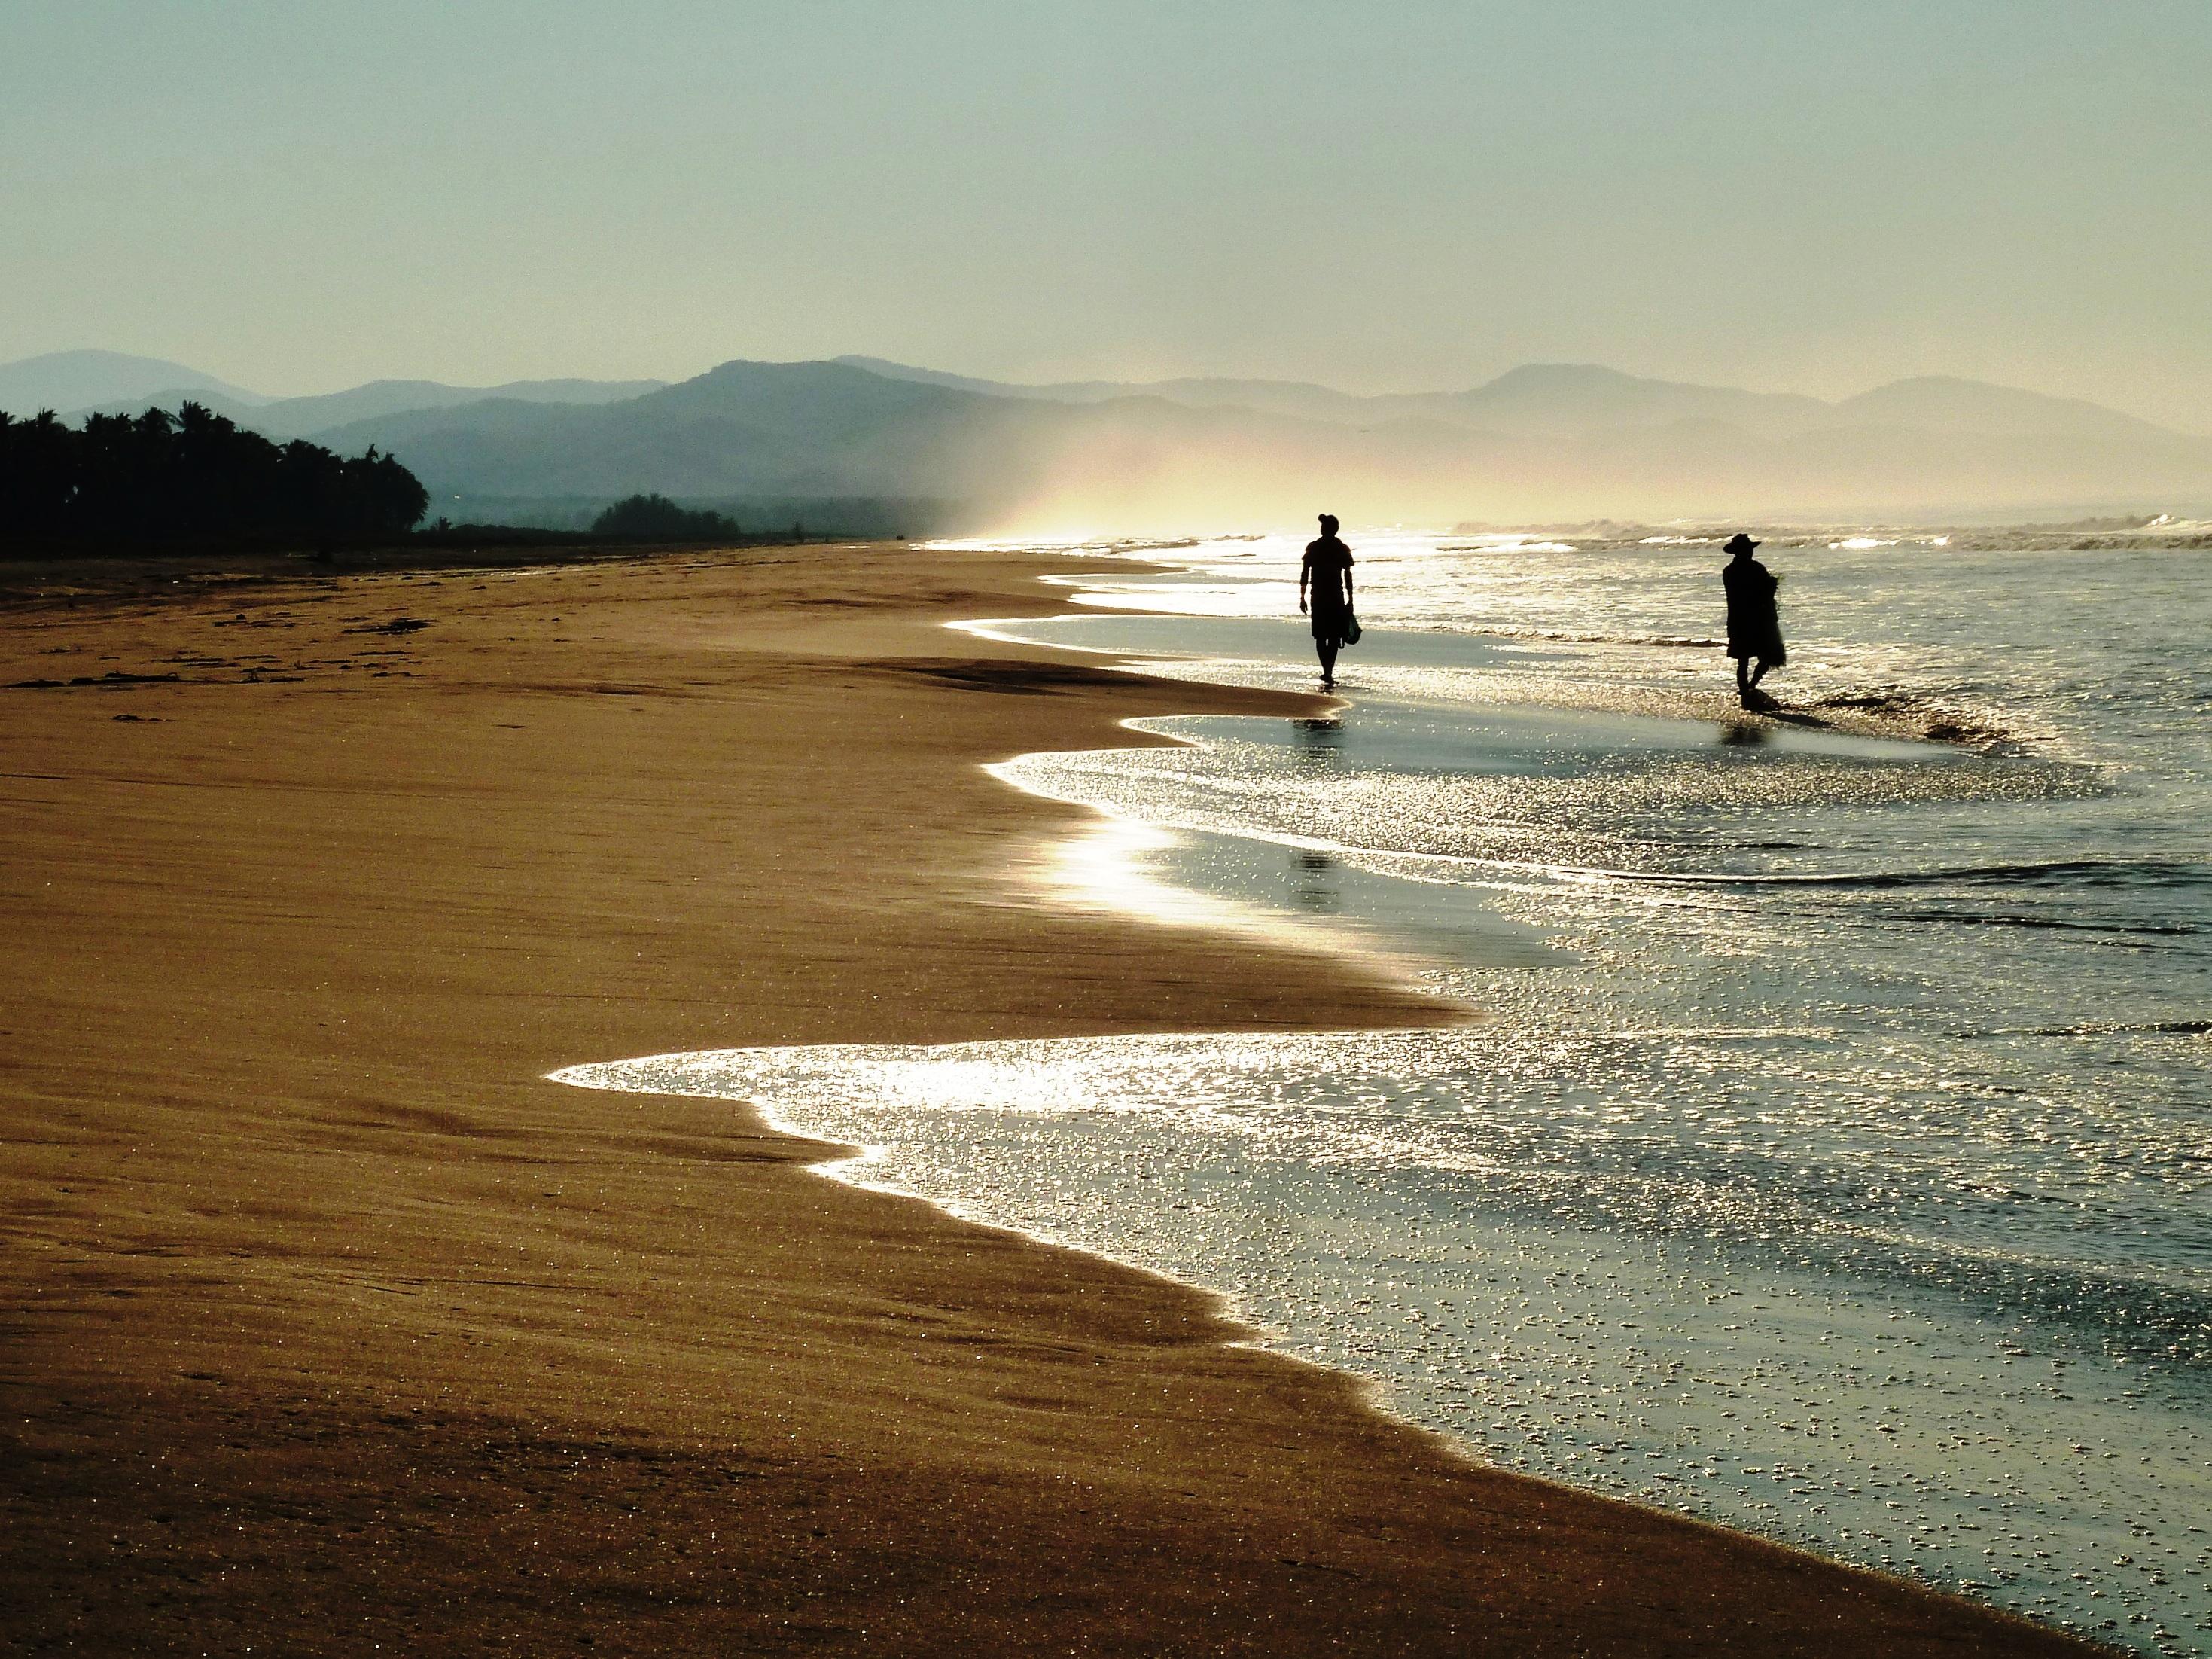 Photo courtesy of Playa Viva – beach image by Amber Isak